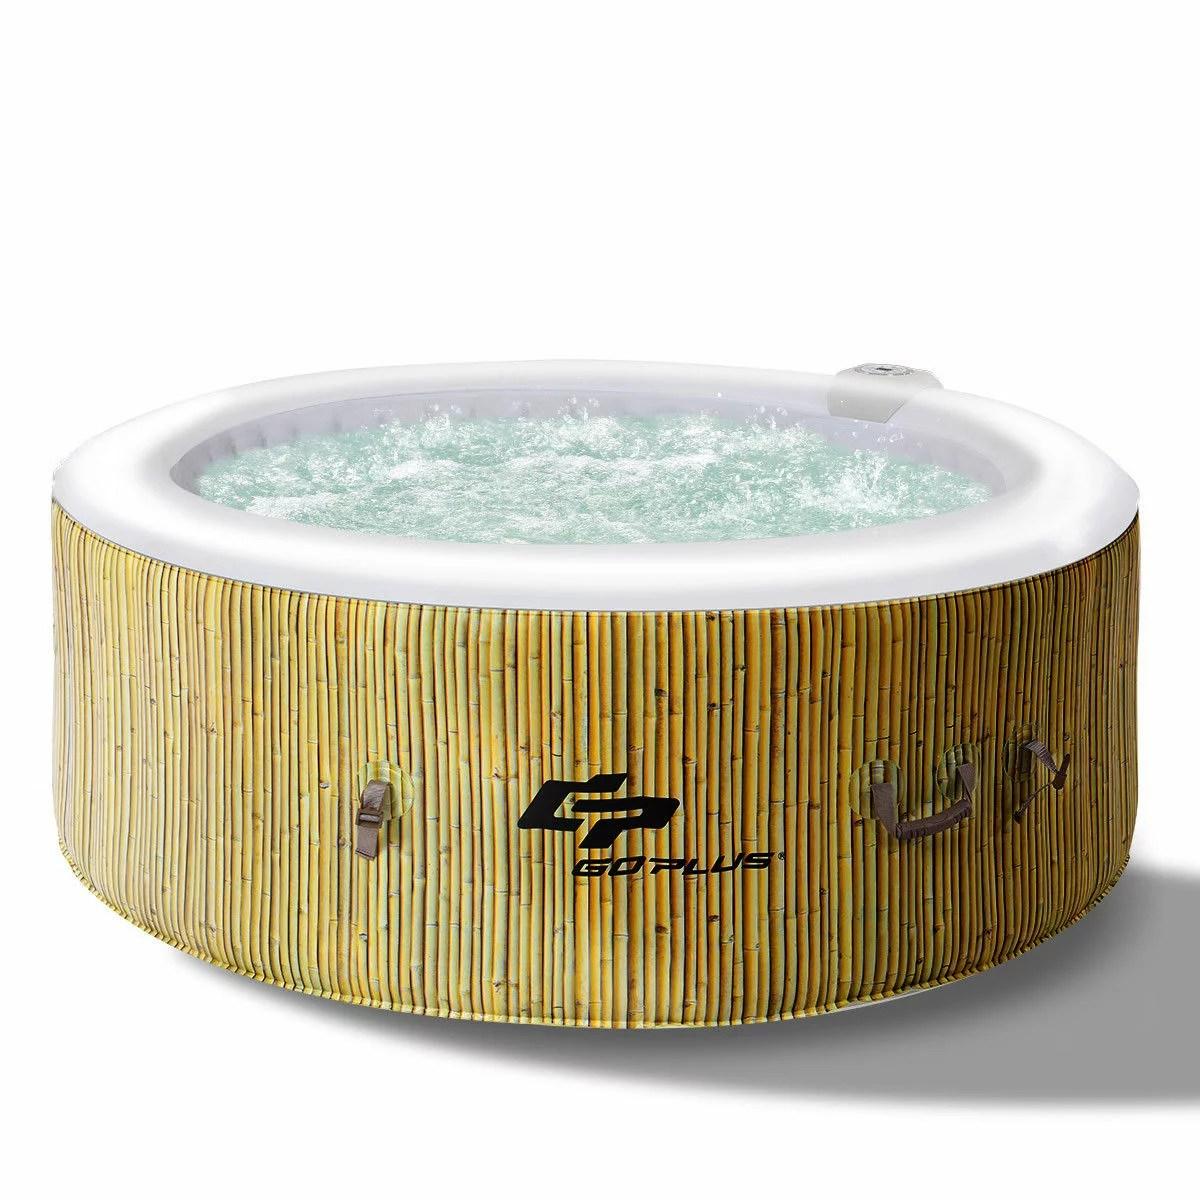 inflatable bubble sofa uk kincaid reviews 2 person hot tub table ideas